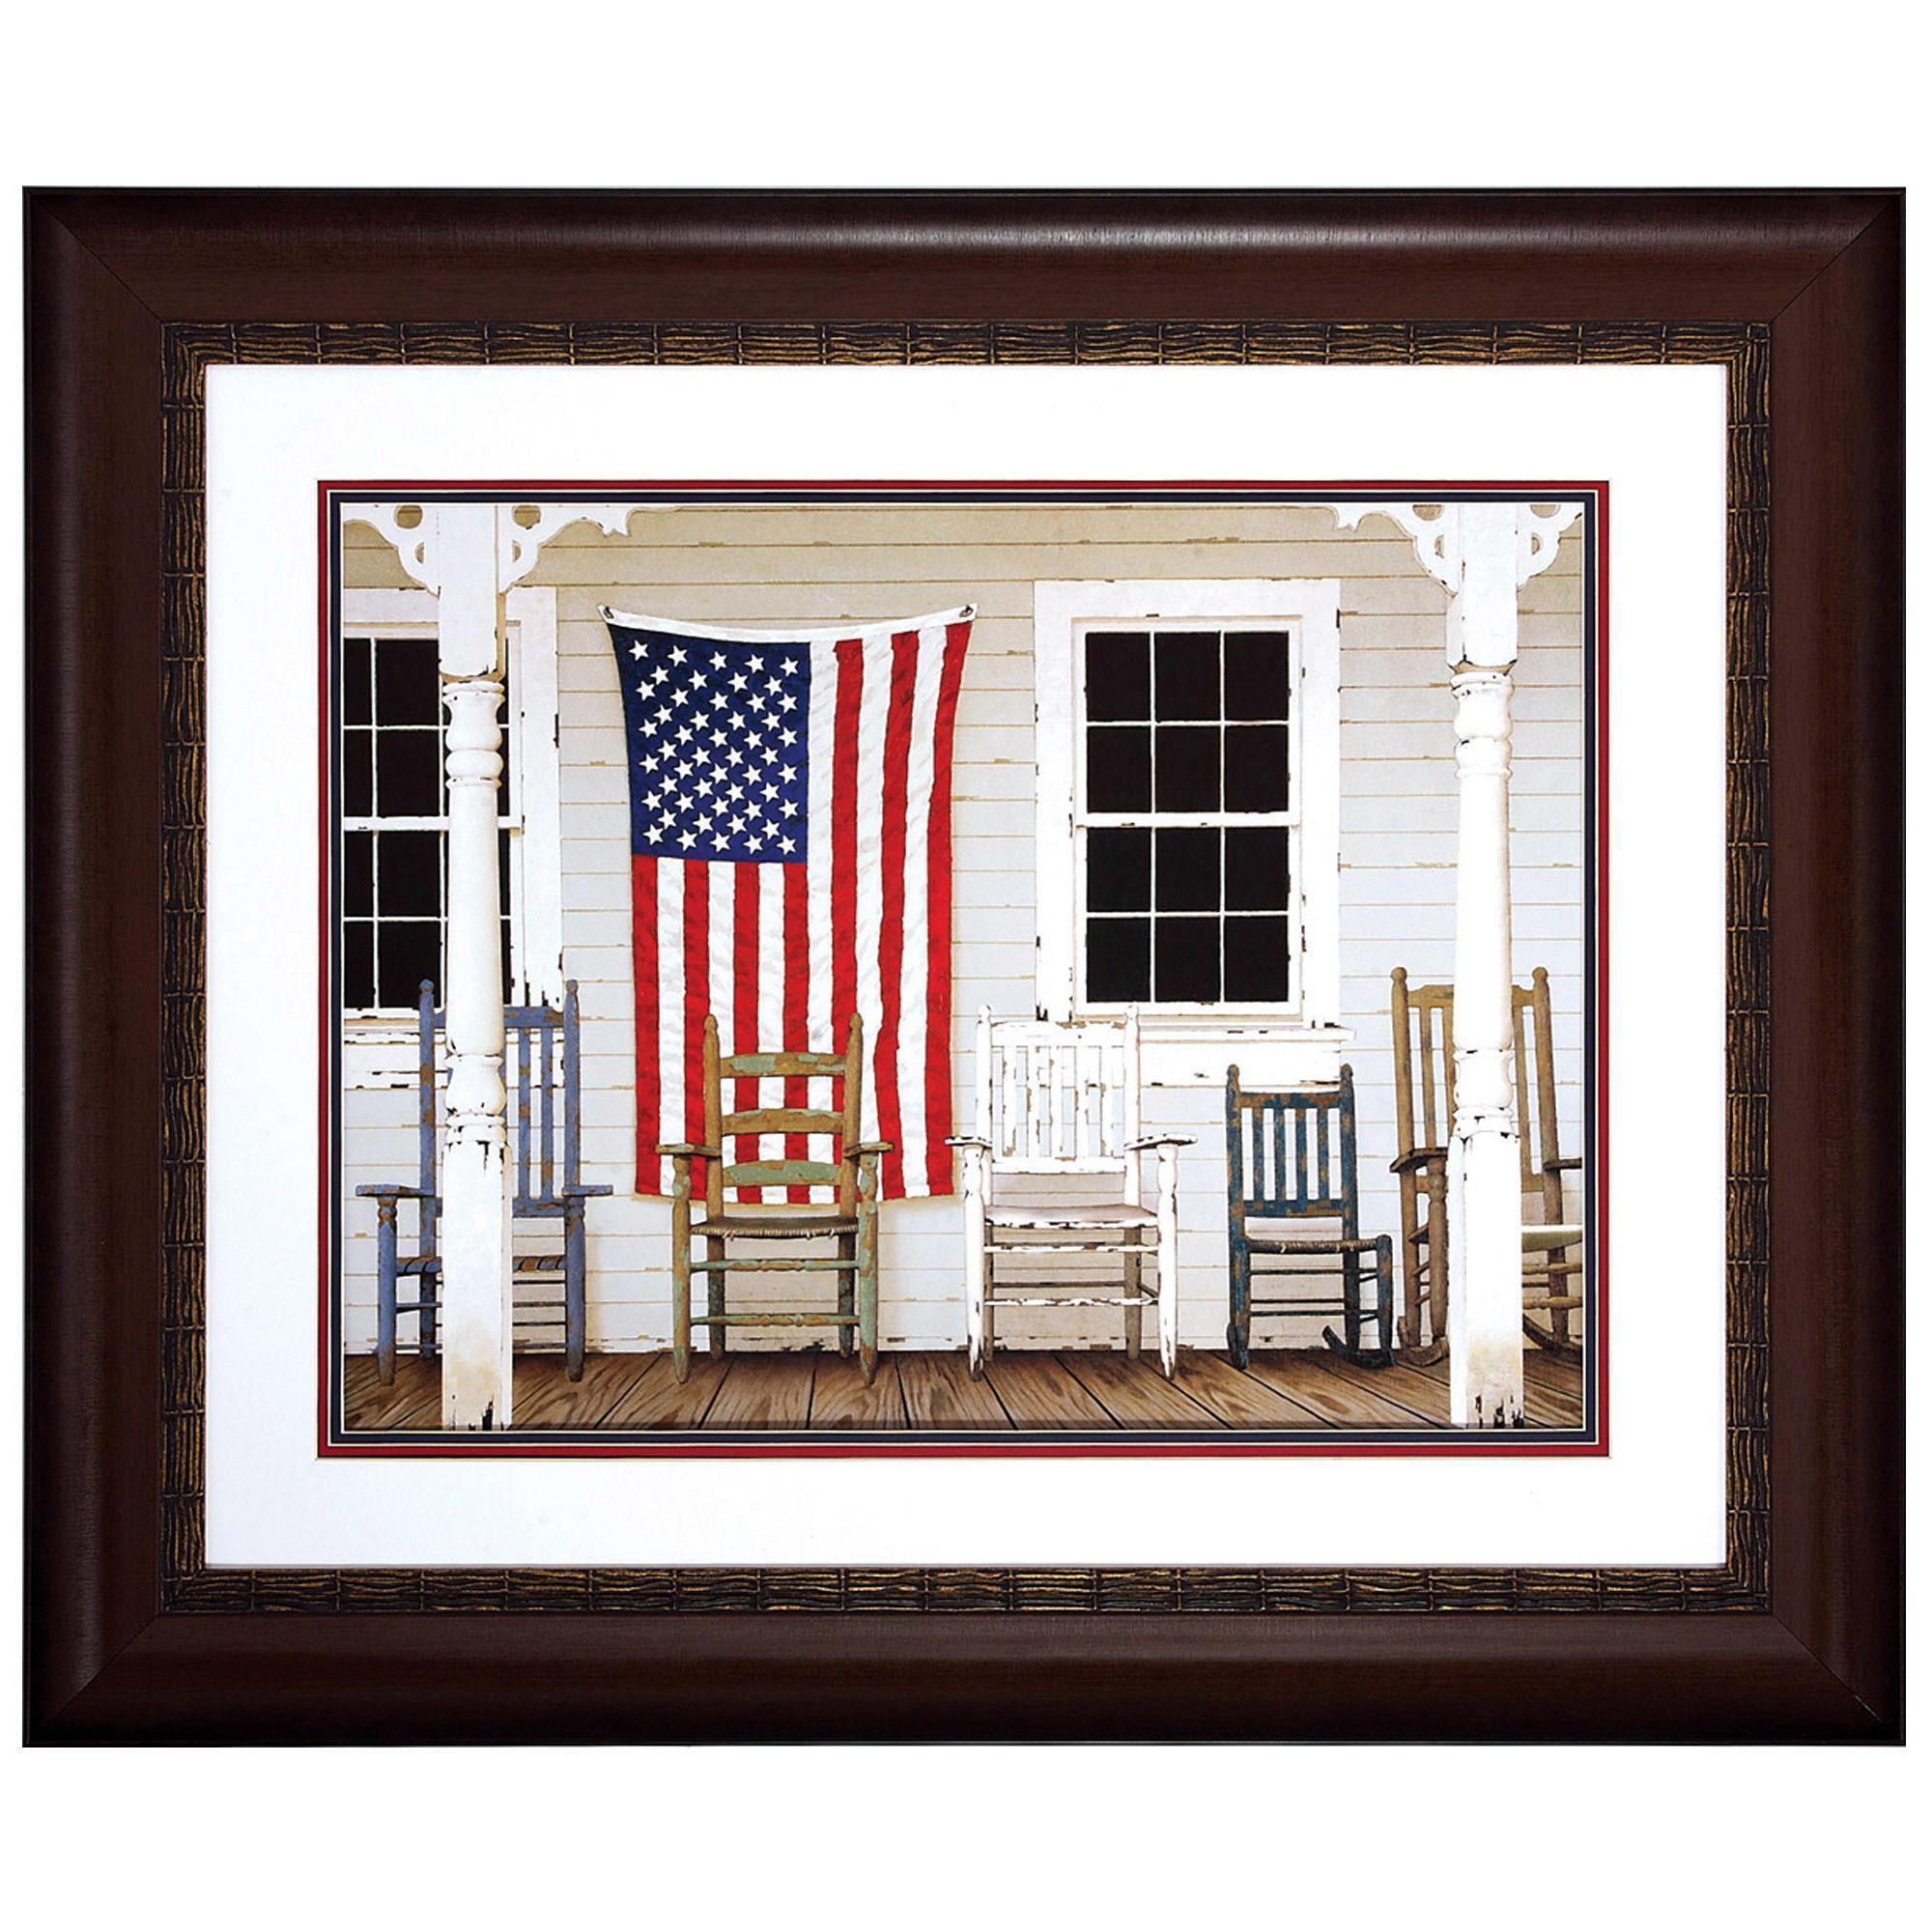 "American Porch Print- 34"" x 28"""